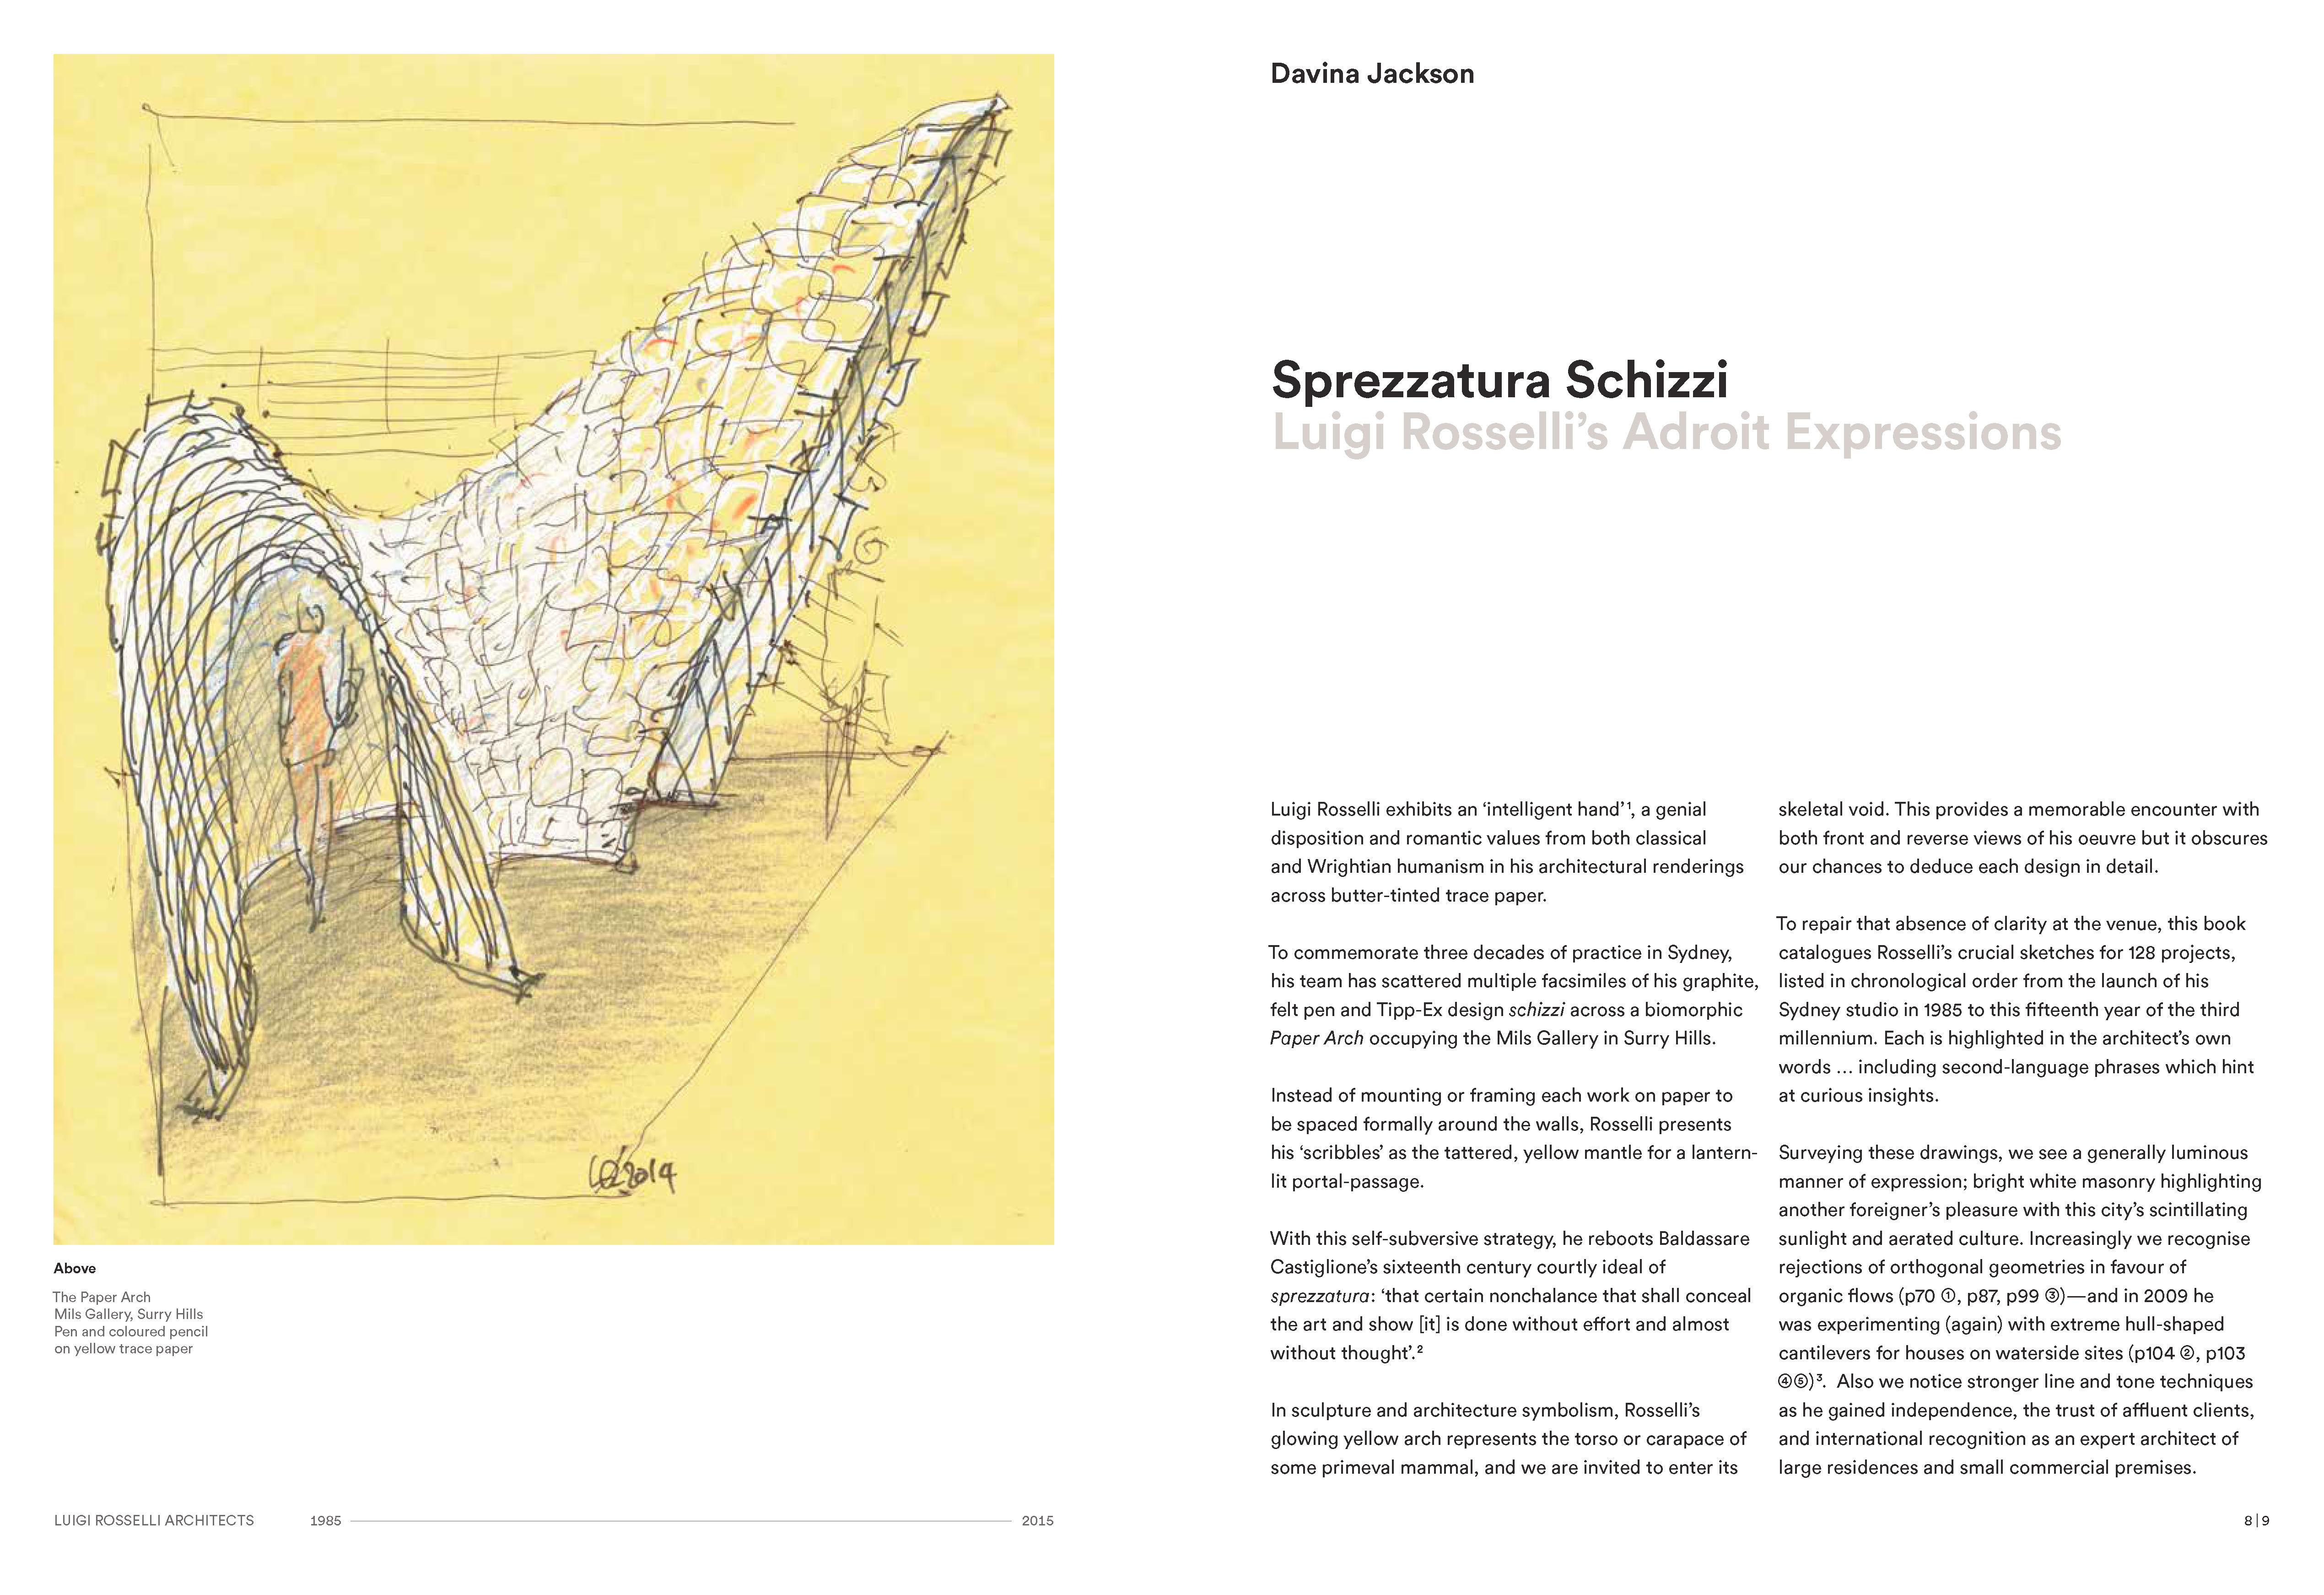 Luigi Rosselli: Perspectives